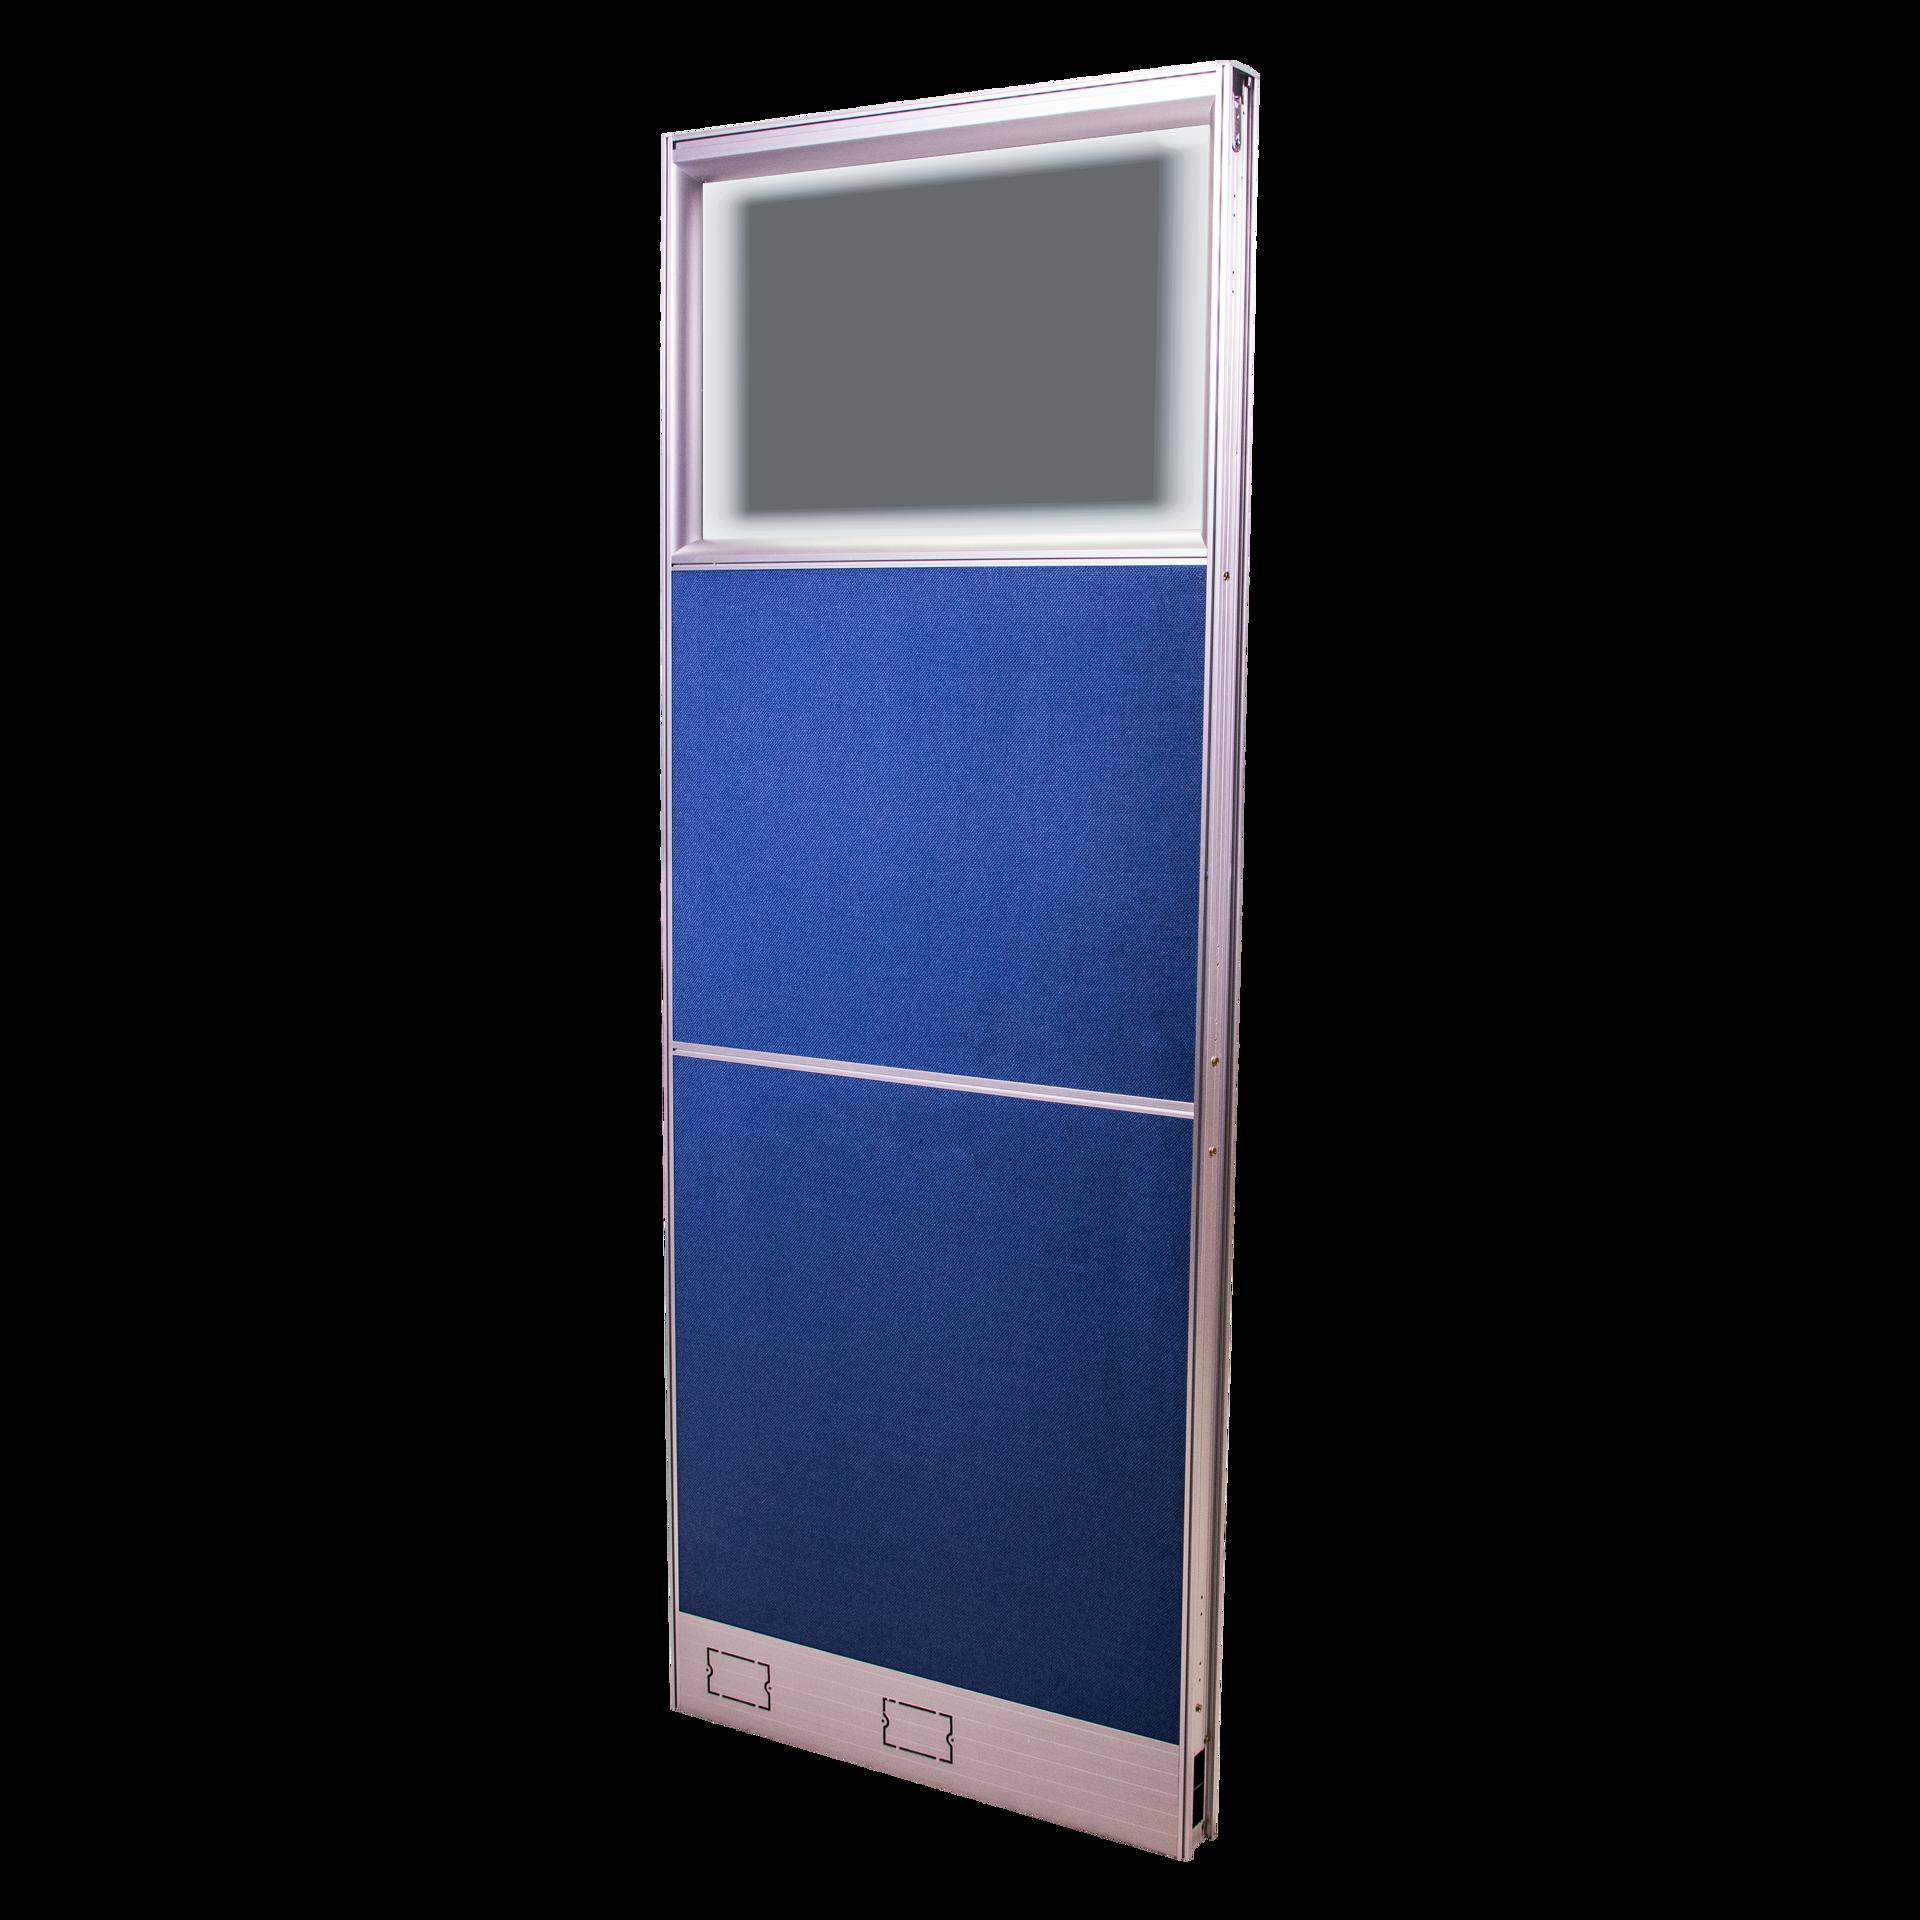 Picture of AZ-P4066 Image 600 x 1600 Panel w/Glass - Blue